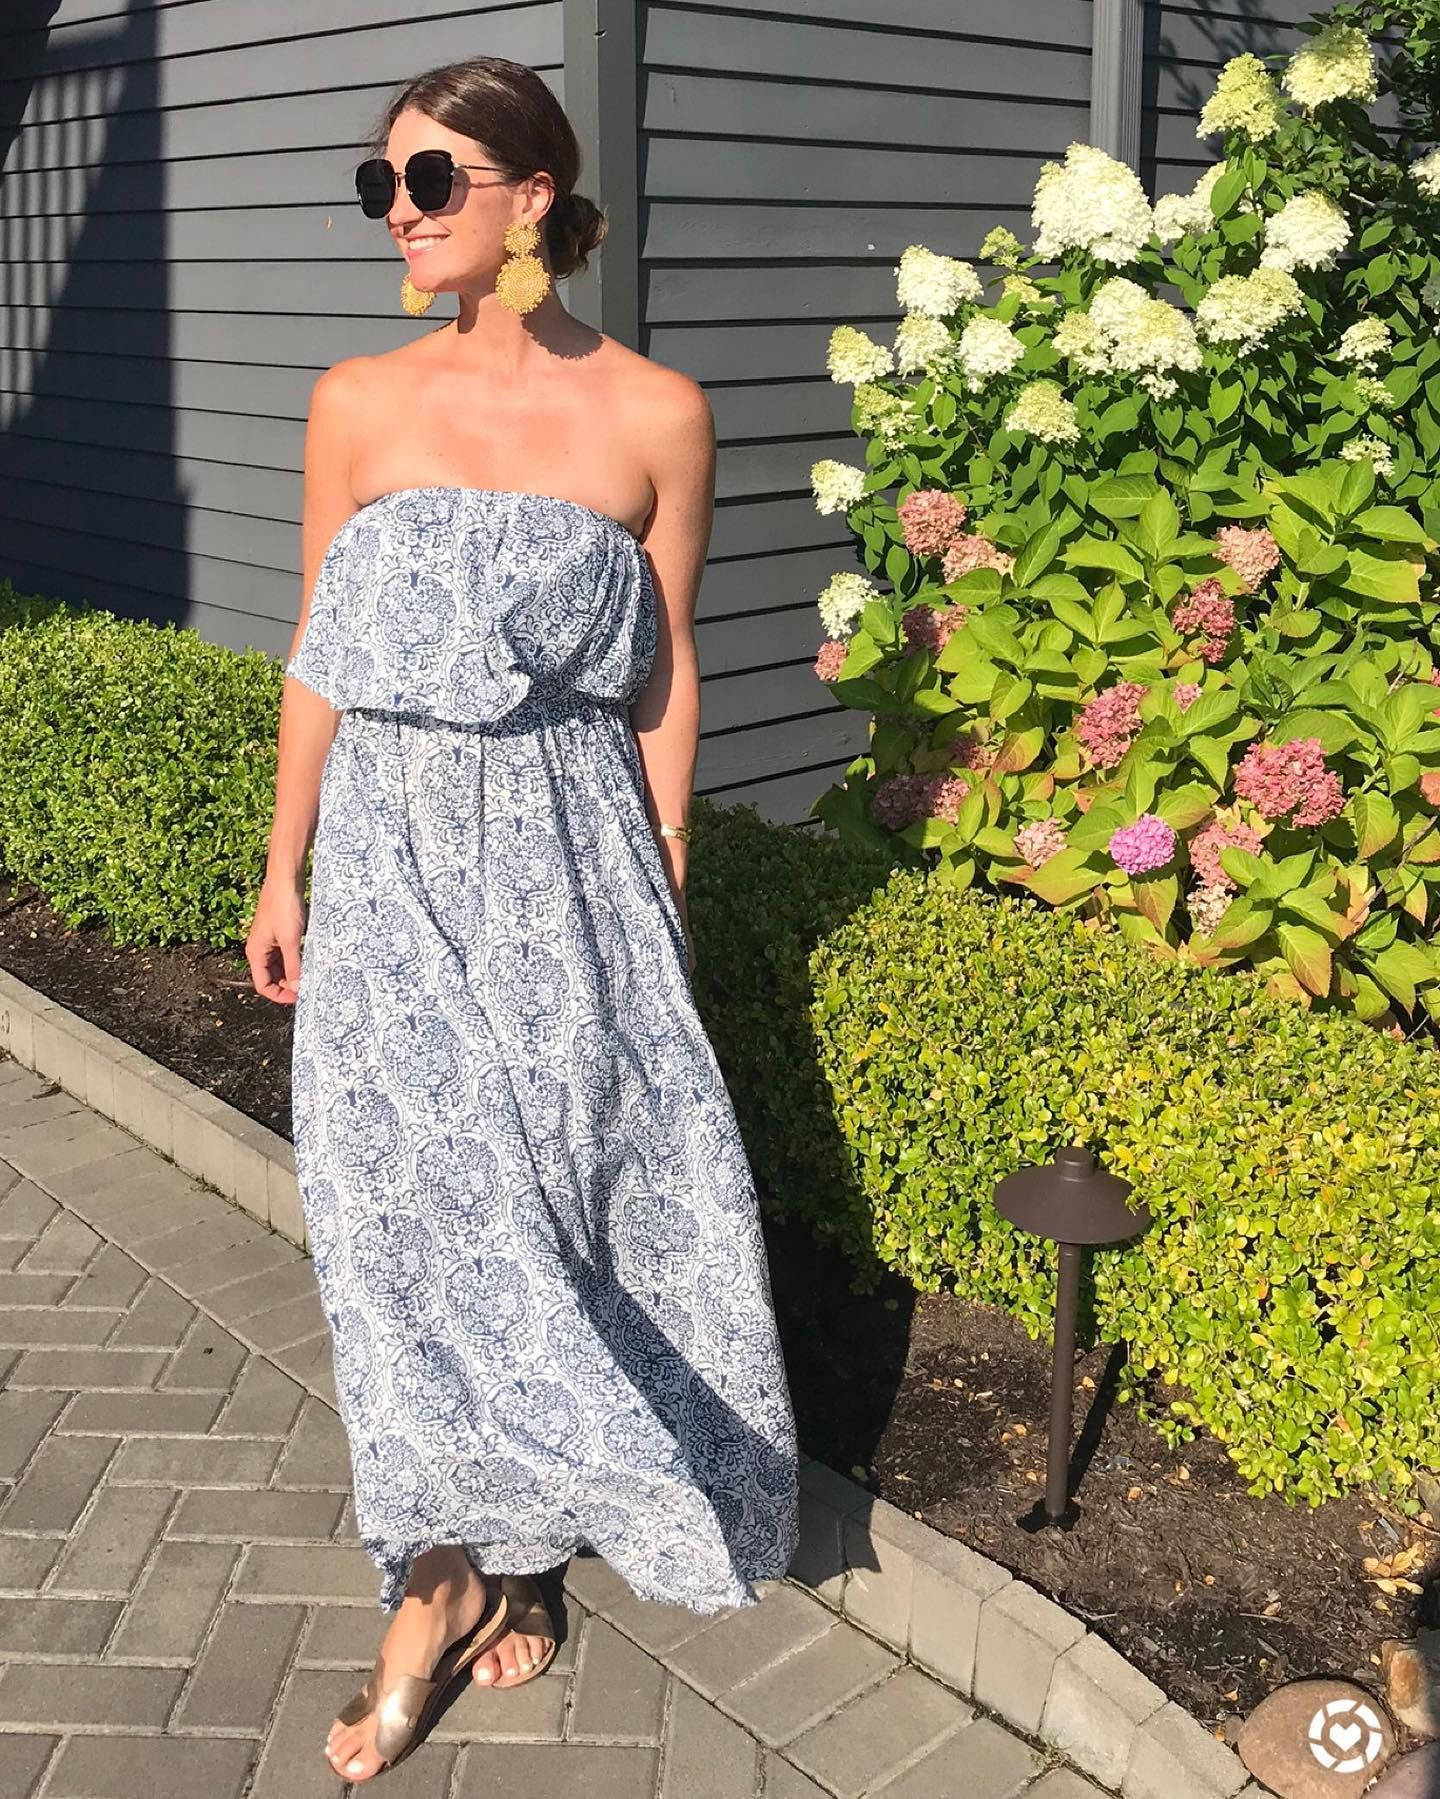 Amazon Maxi Dress Summer Style Summer Maxi Dress Summer Dresses Rainy Day Dress Outfit [ 1799 x 1440 Pixel ]